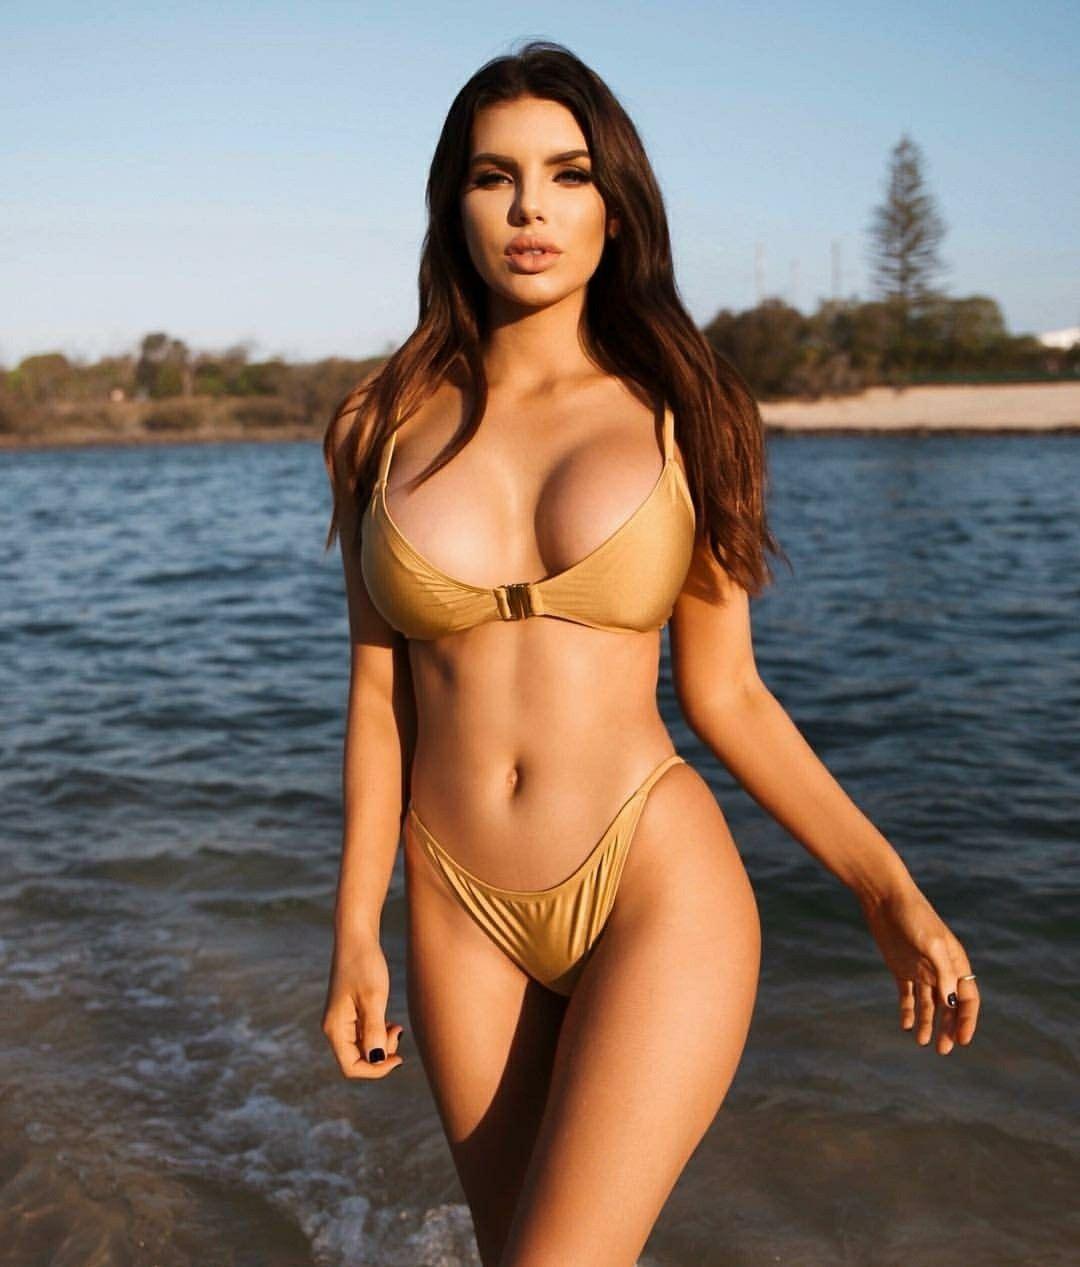 Bikini Nicole Thorne naked (88 photos), Topless, Paparazzi, Instagram, swimsuit 2006